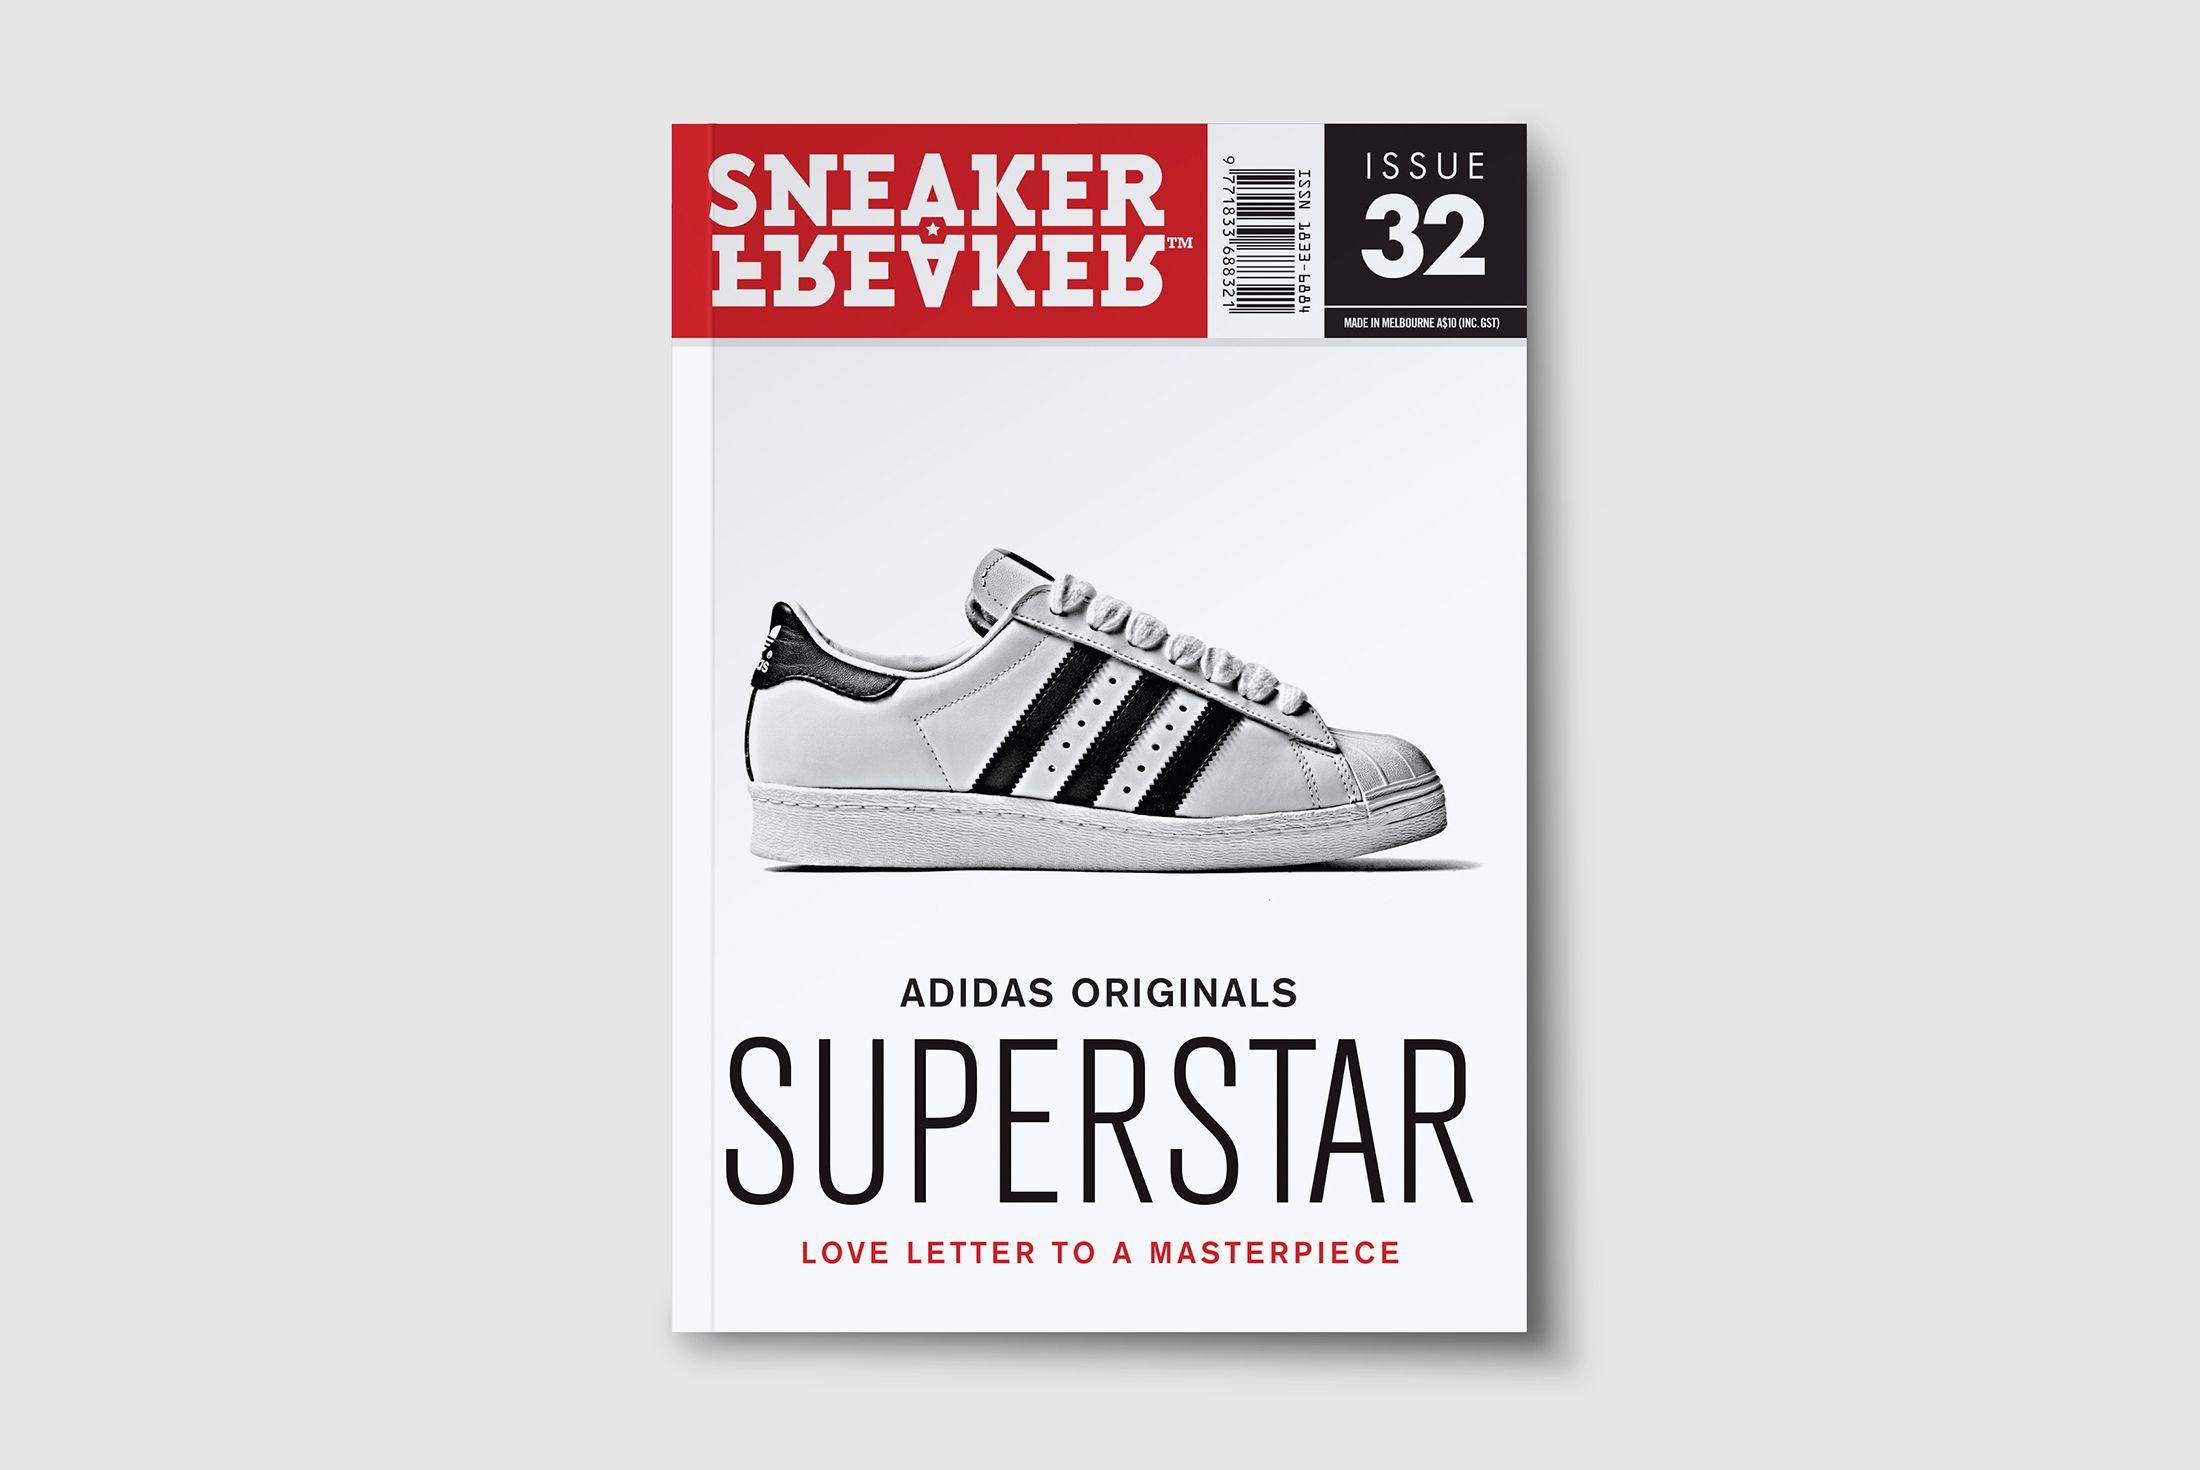 Sneaker Freaker Issue 31-40